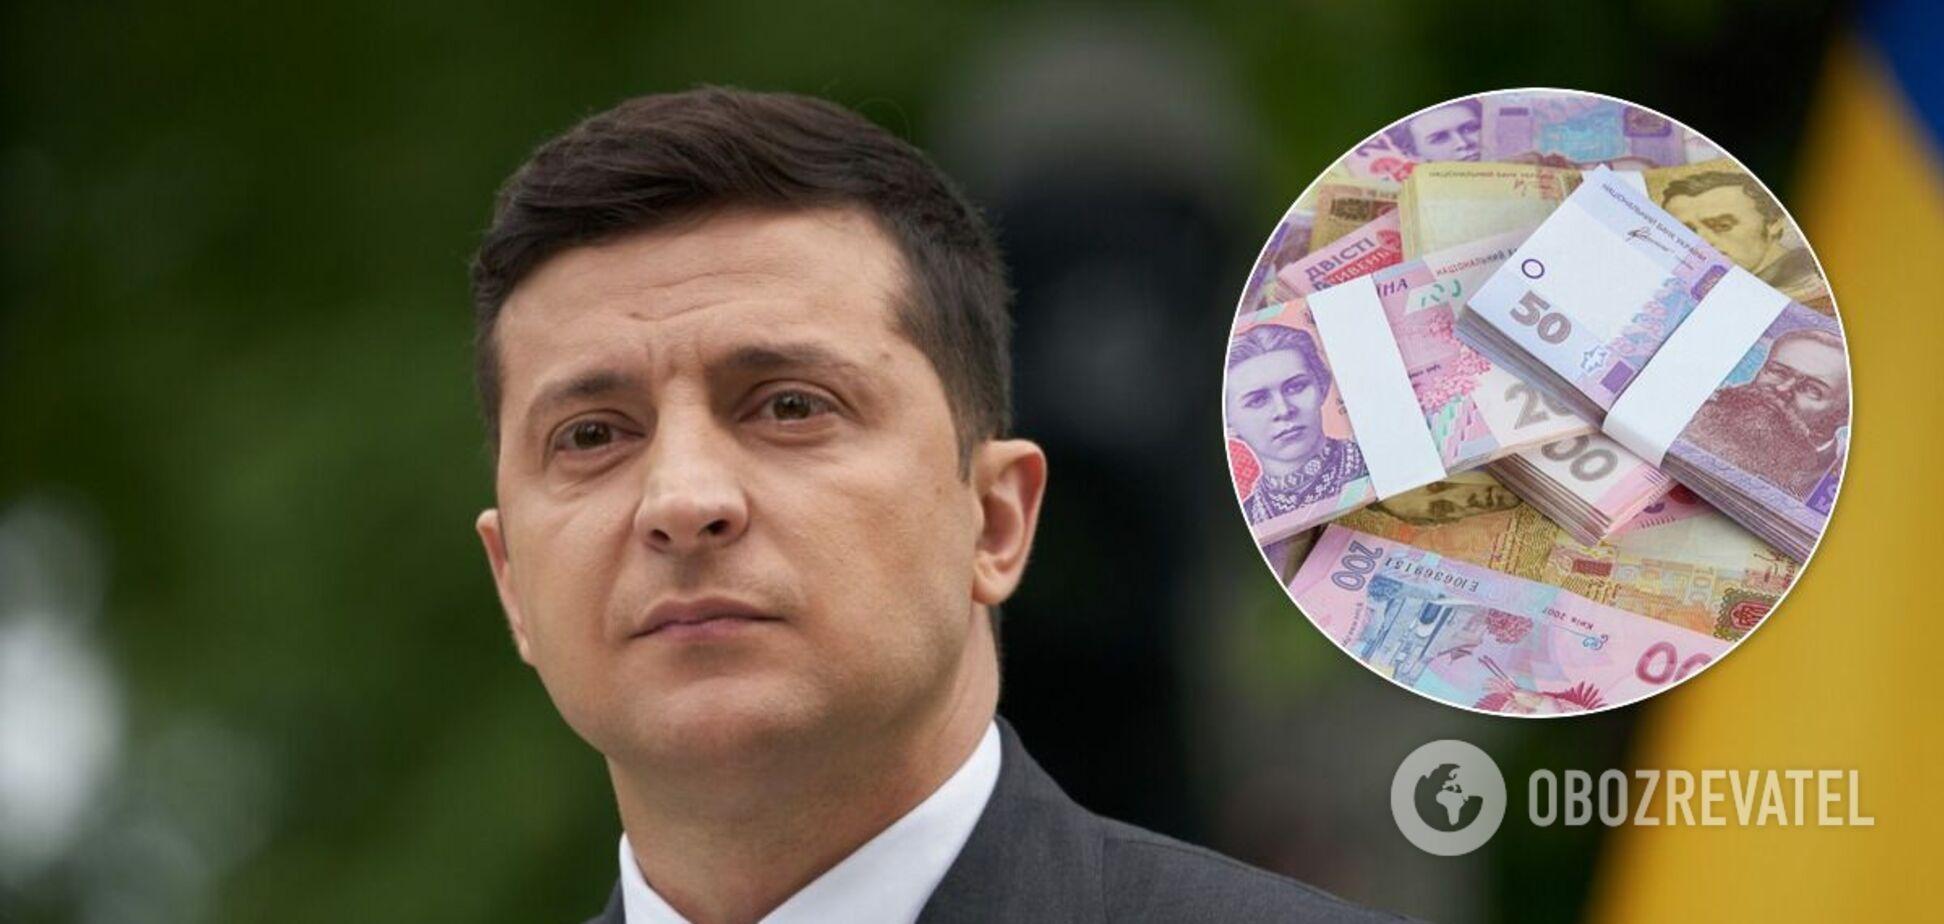 Сколько потратят на президента Зеленского